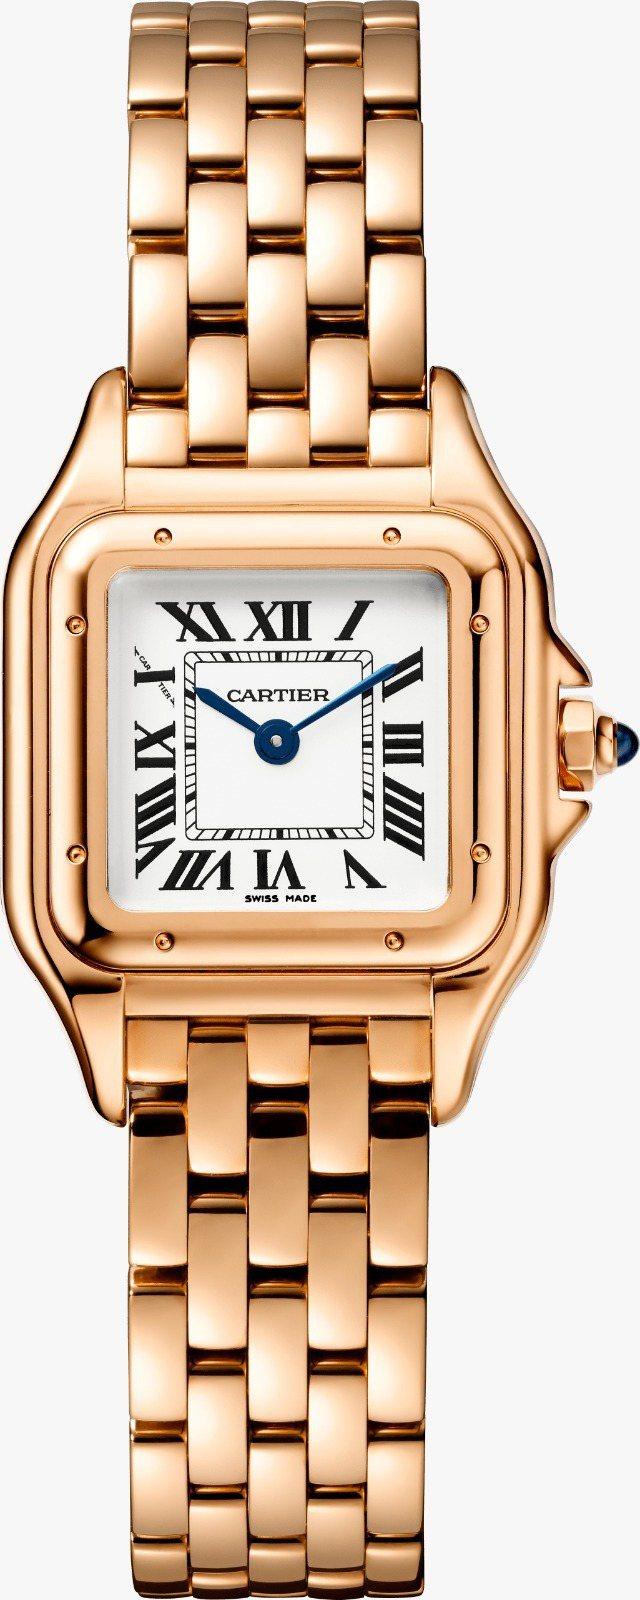 PANTHÈRE DE CARTIER美洲豹腕表玫瑰金小型款,61万5,000元。图/卡地亚提供